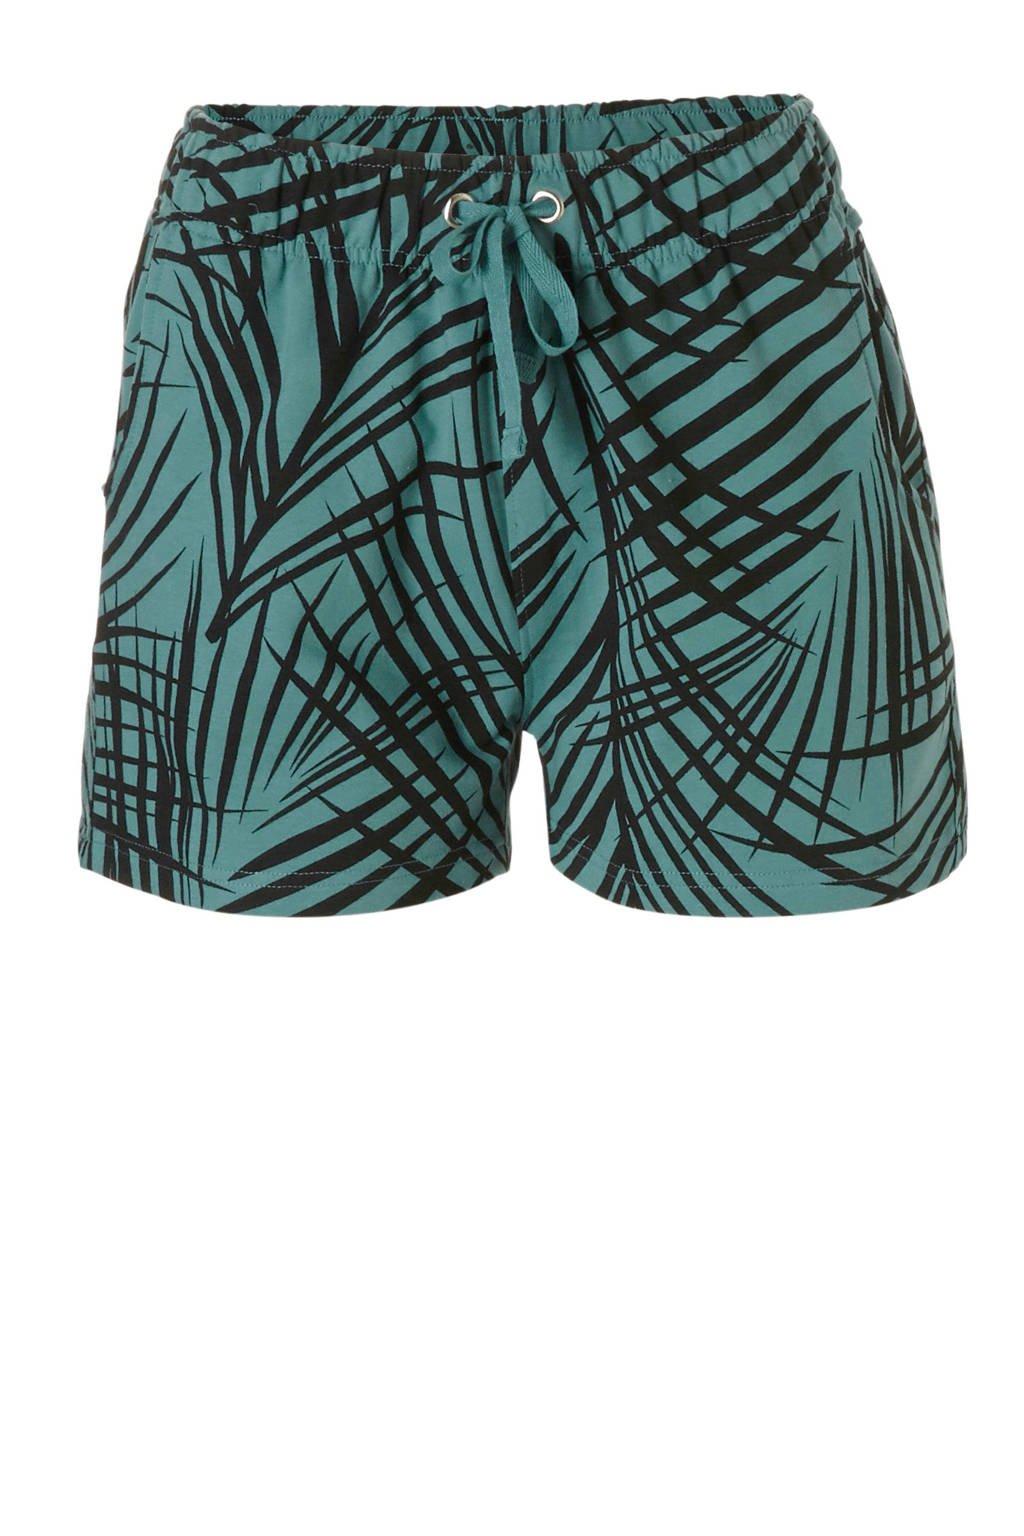 whkmp's beachwave regular fit sweatshort met bladprint turquoise/zwart, Turquoise/zwart